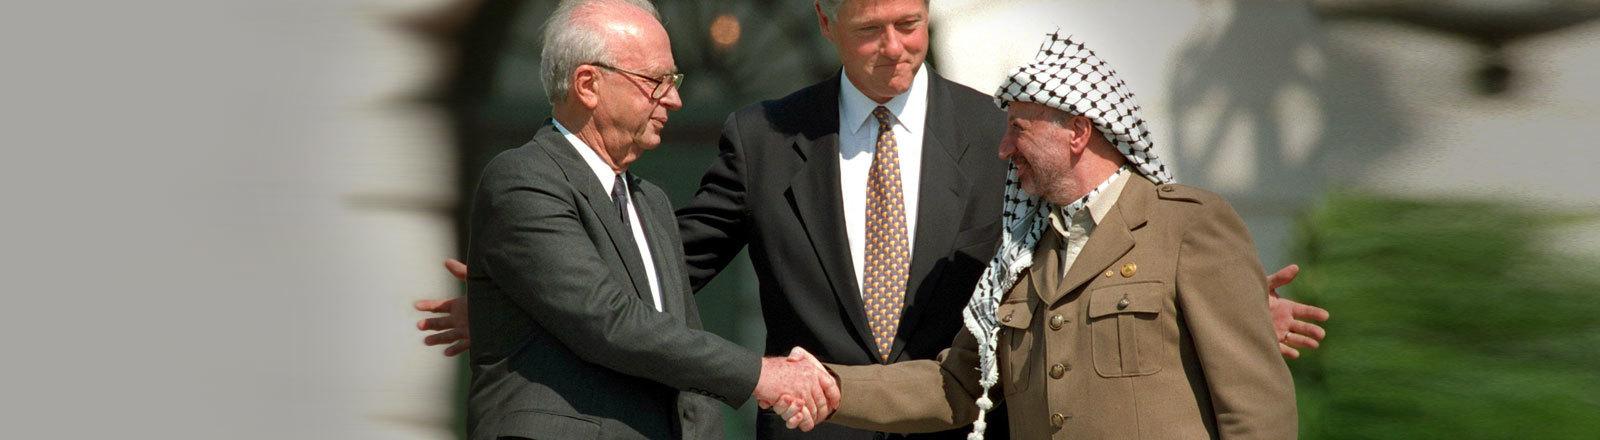 Yitzhak Rabin, Bill Clinton und Jassir Arafat